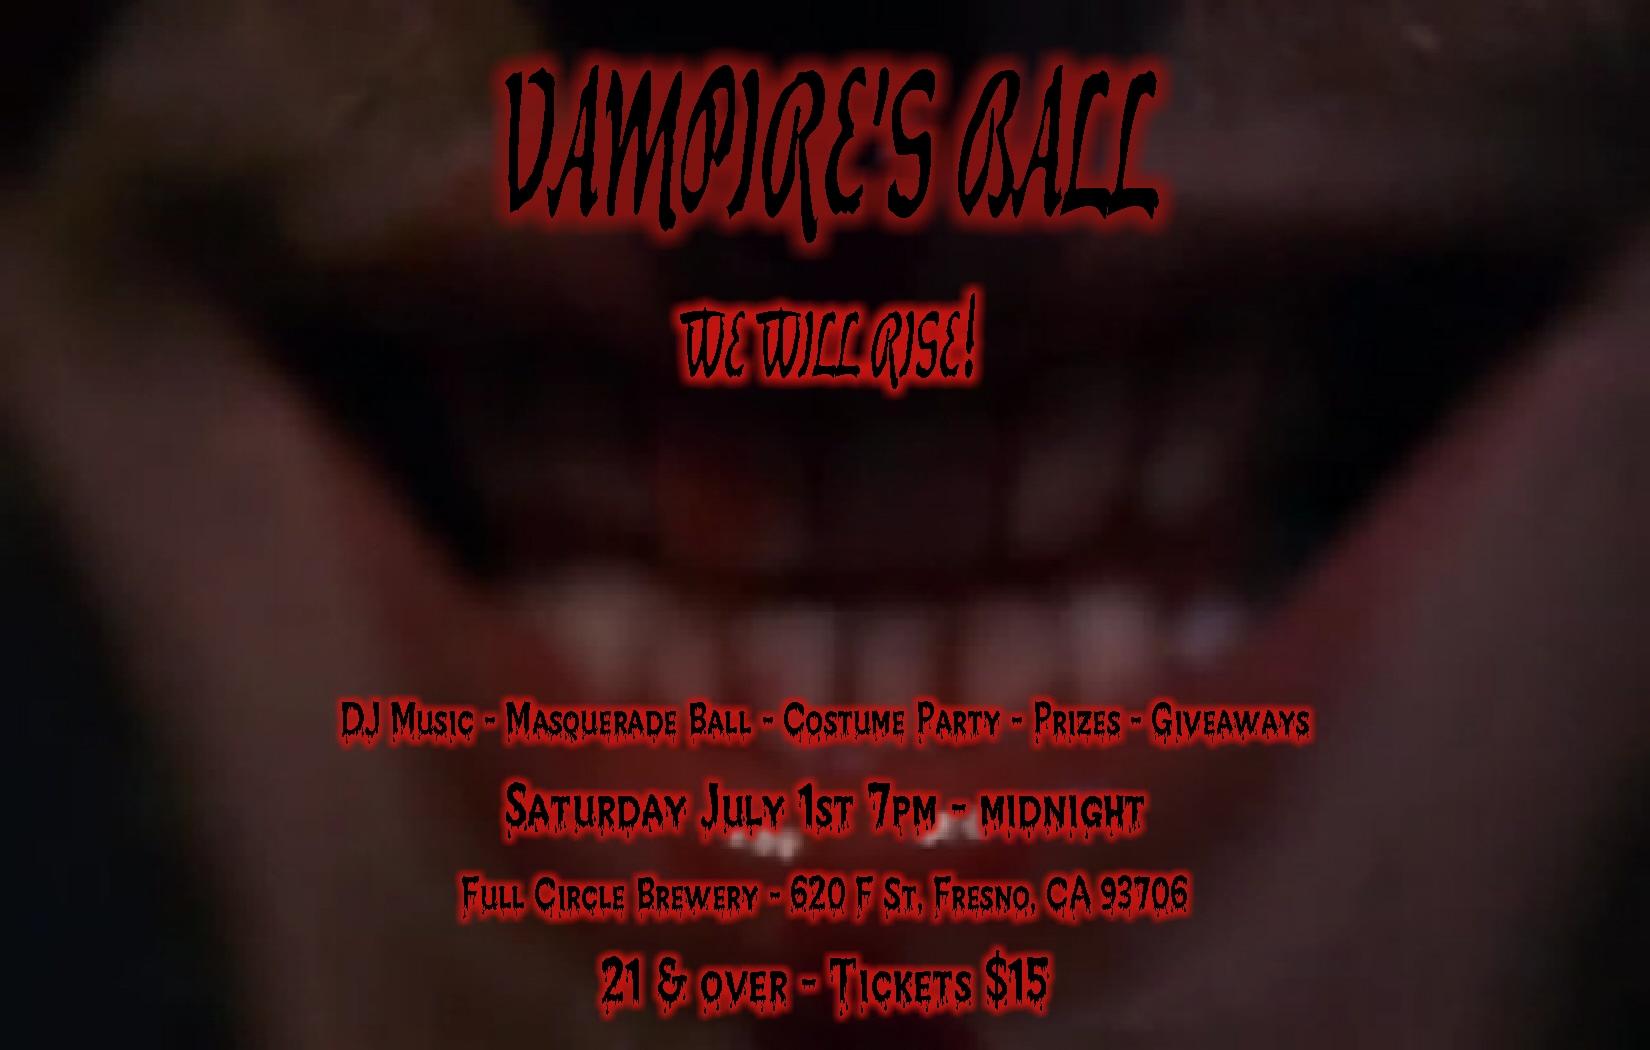 Vampire's Ball - Costume Party